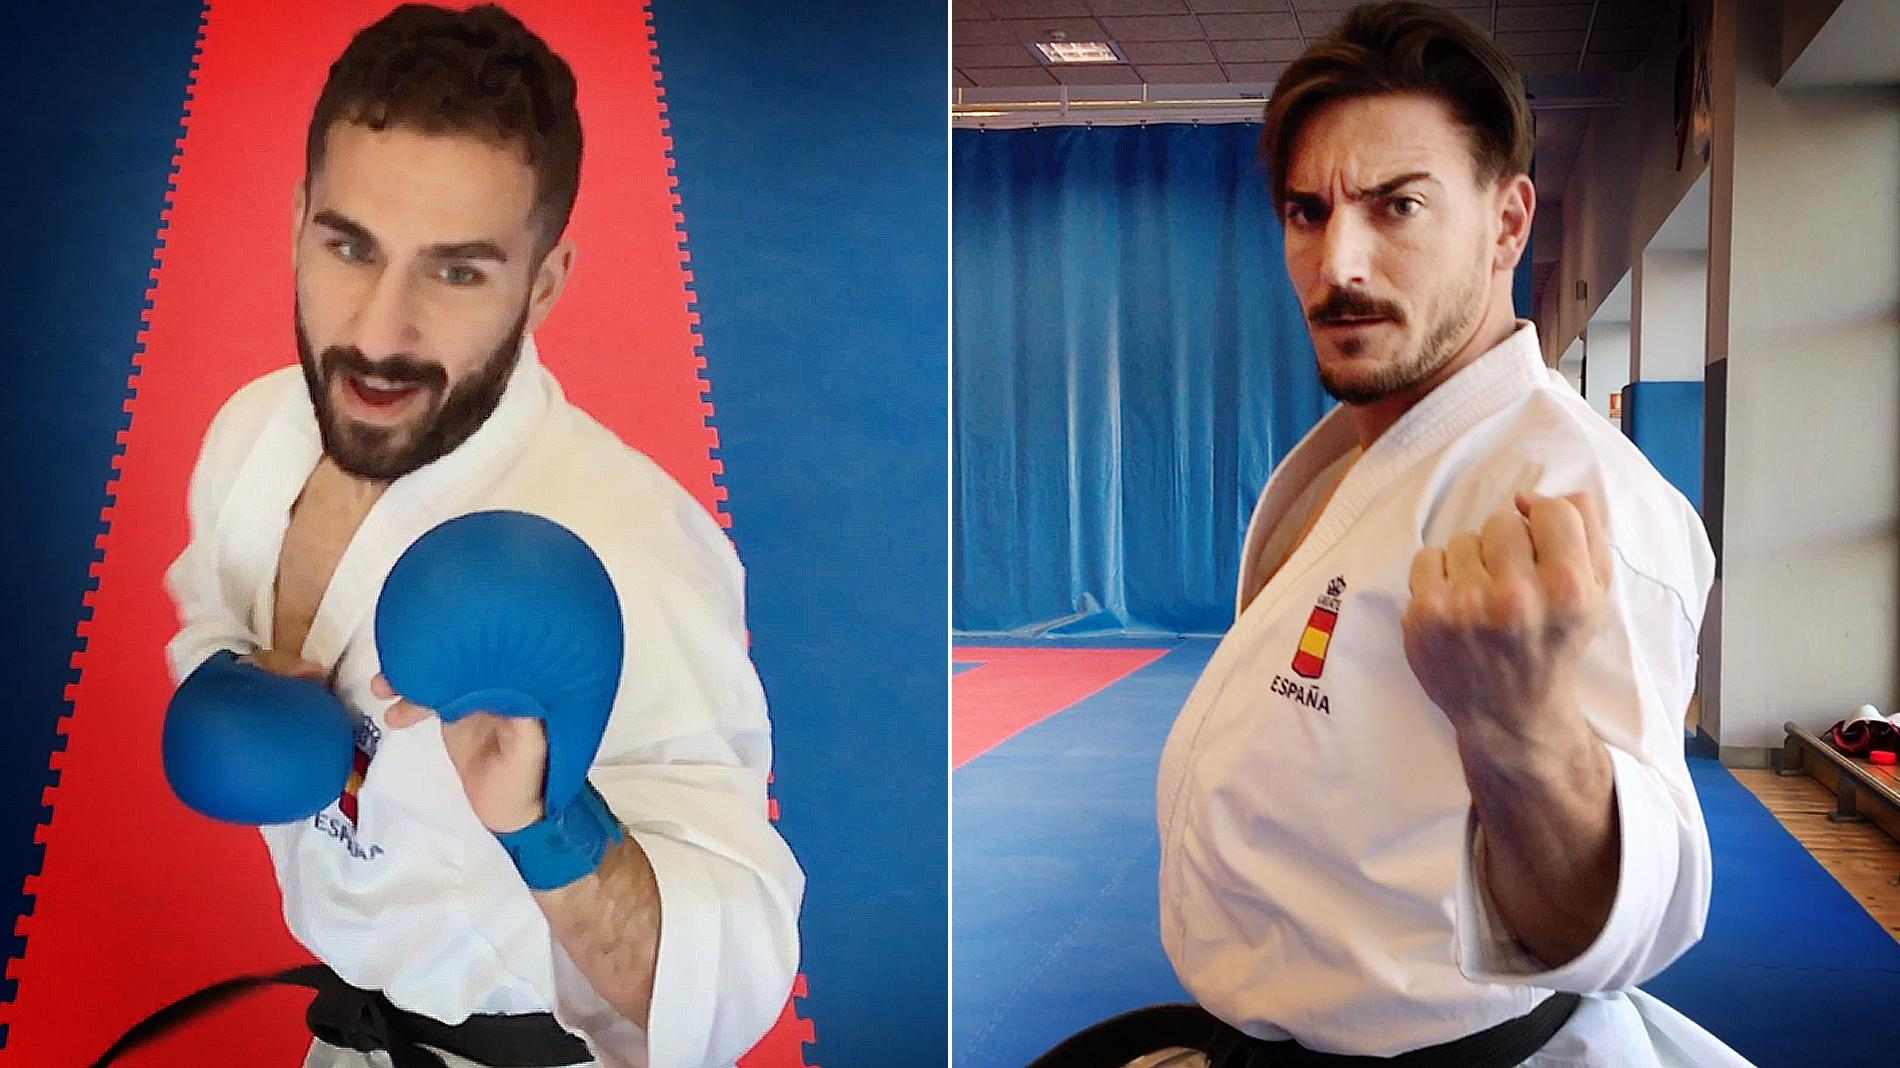 Guerreros del tatami: así es la élite de kárate masculino en España